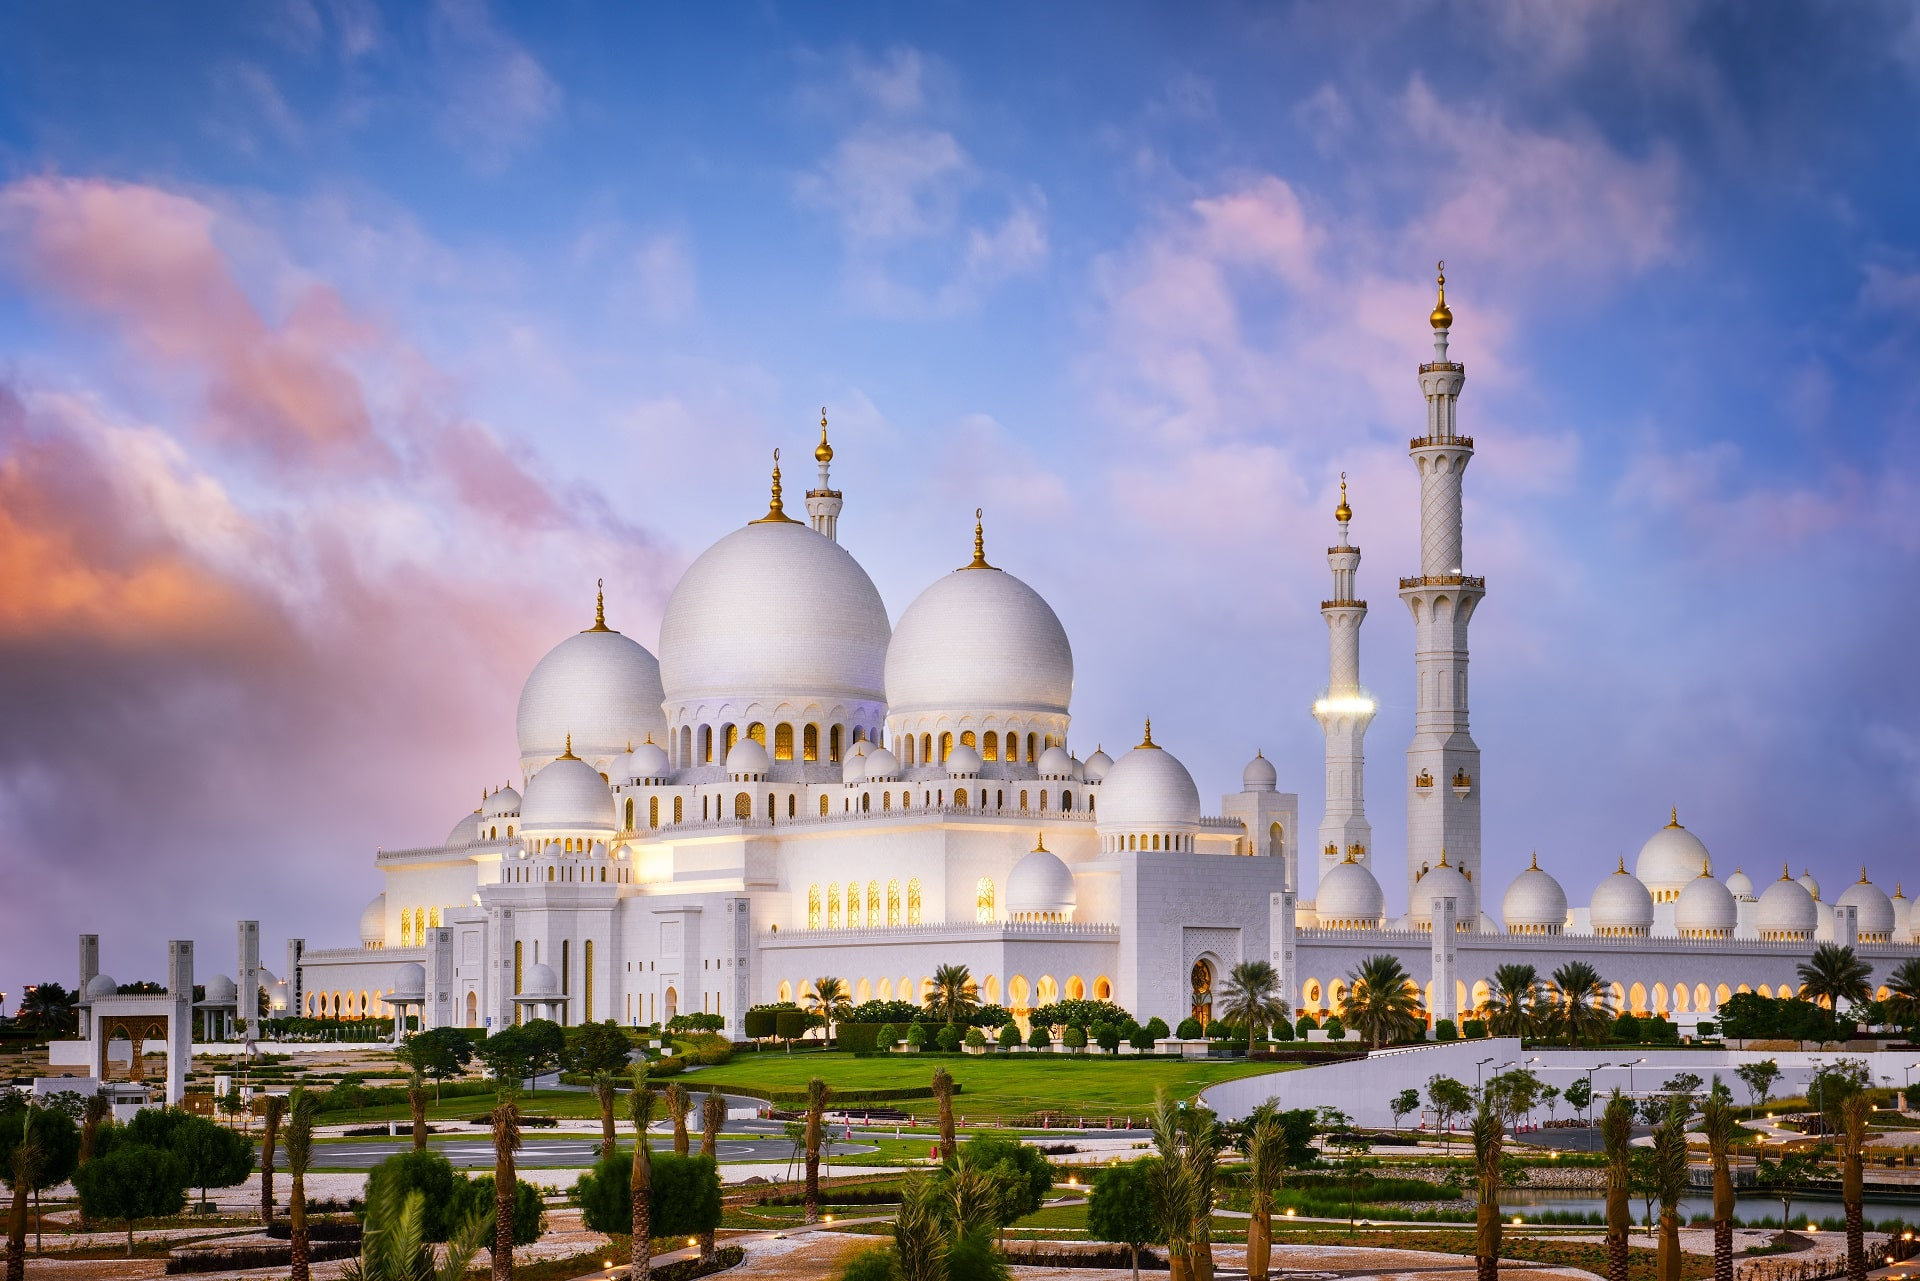 Abu-Dhabi-Mosque-UAE